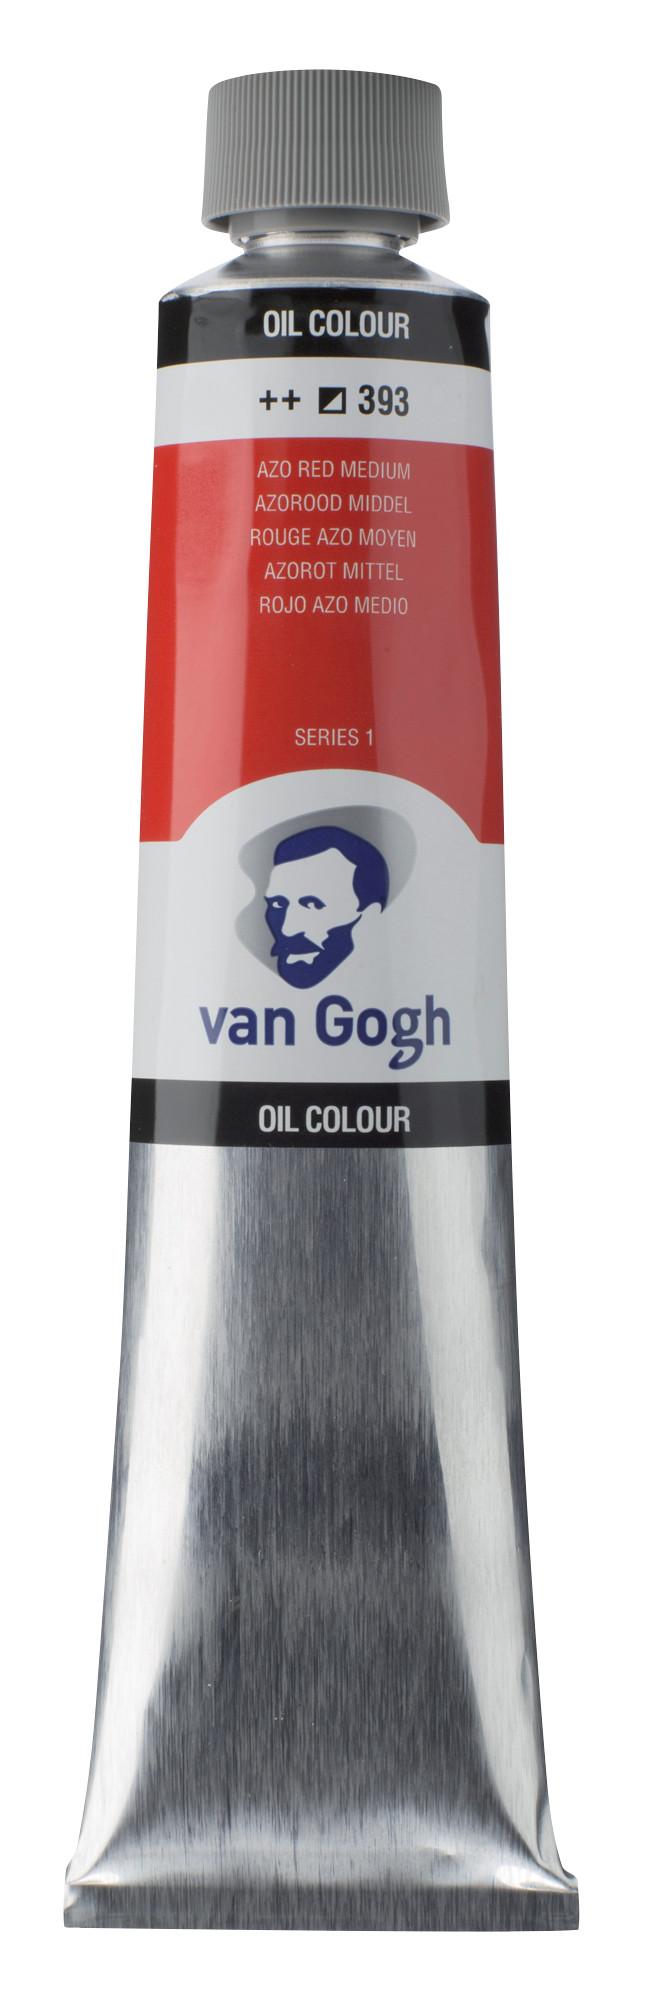 Van Gogh Oil Colour Tube 200 ml Azo Red Medium 393